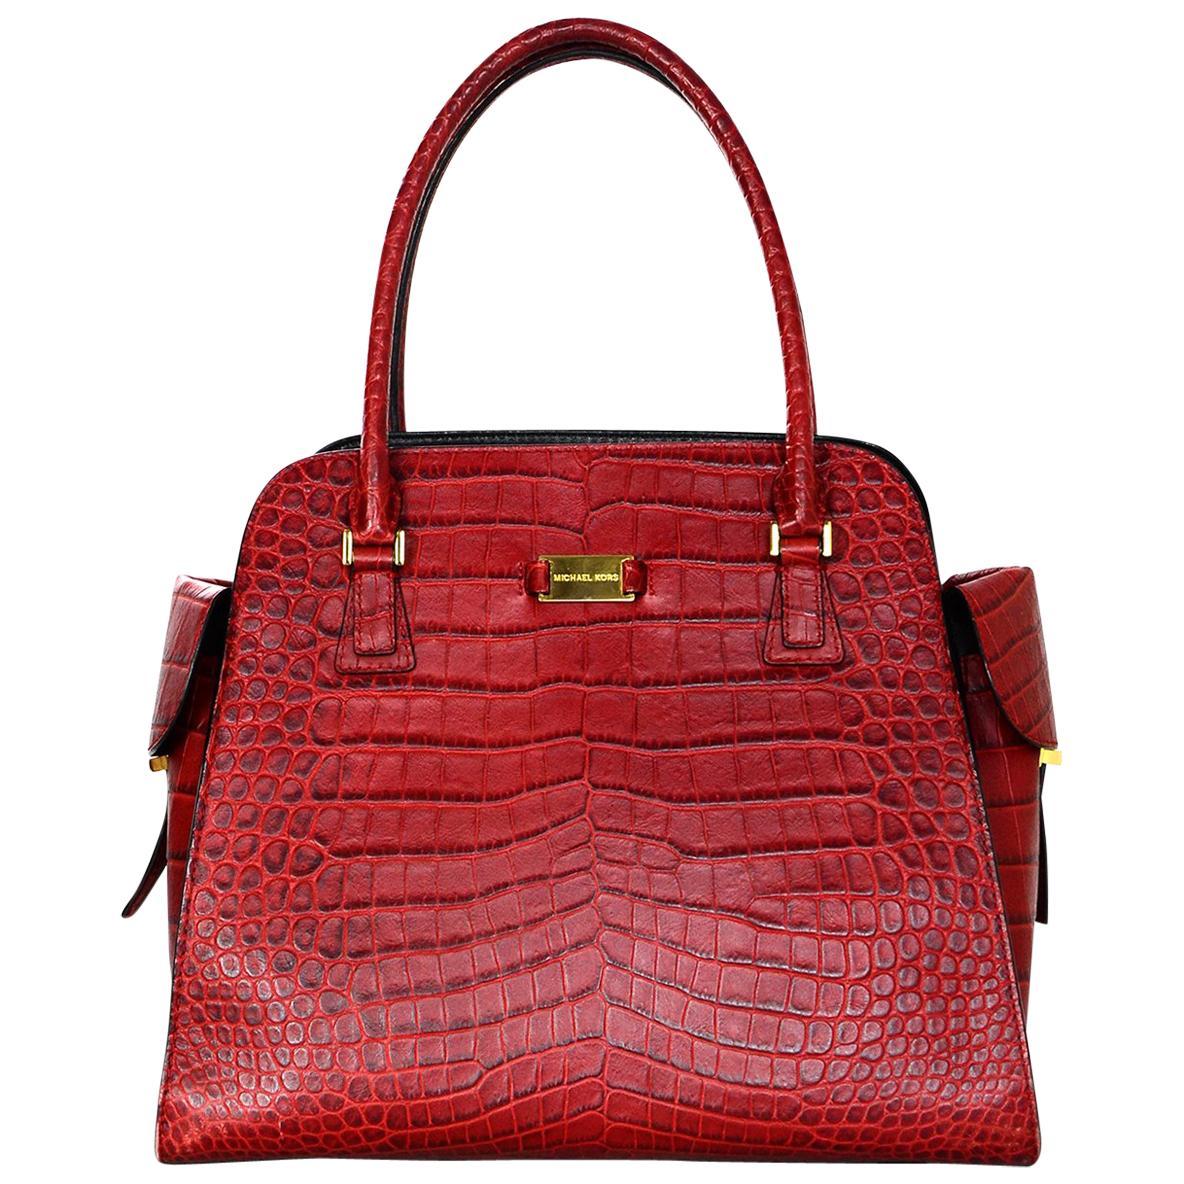 michael kors red leather embossed croc gia tote bag w side pockets rh 1stdibs com